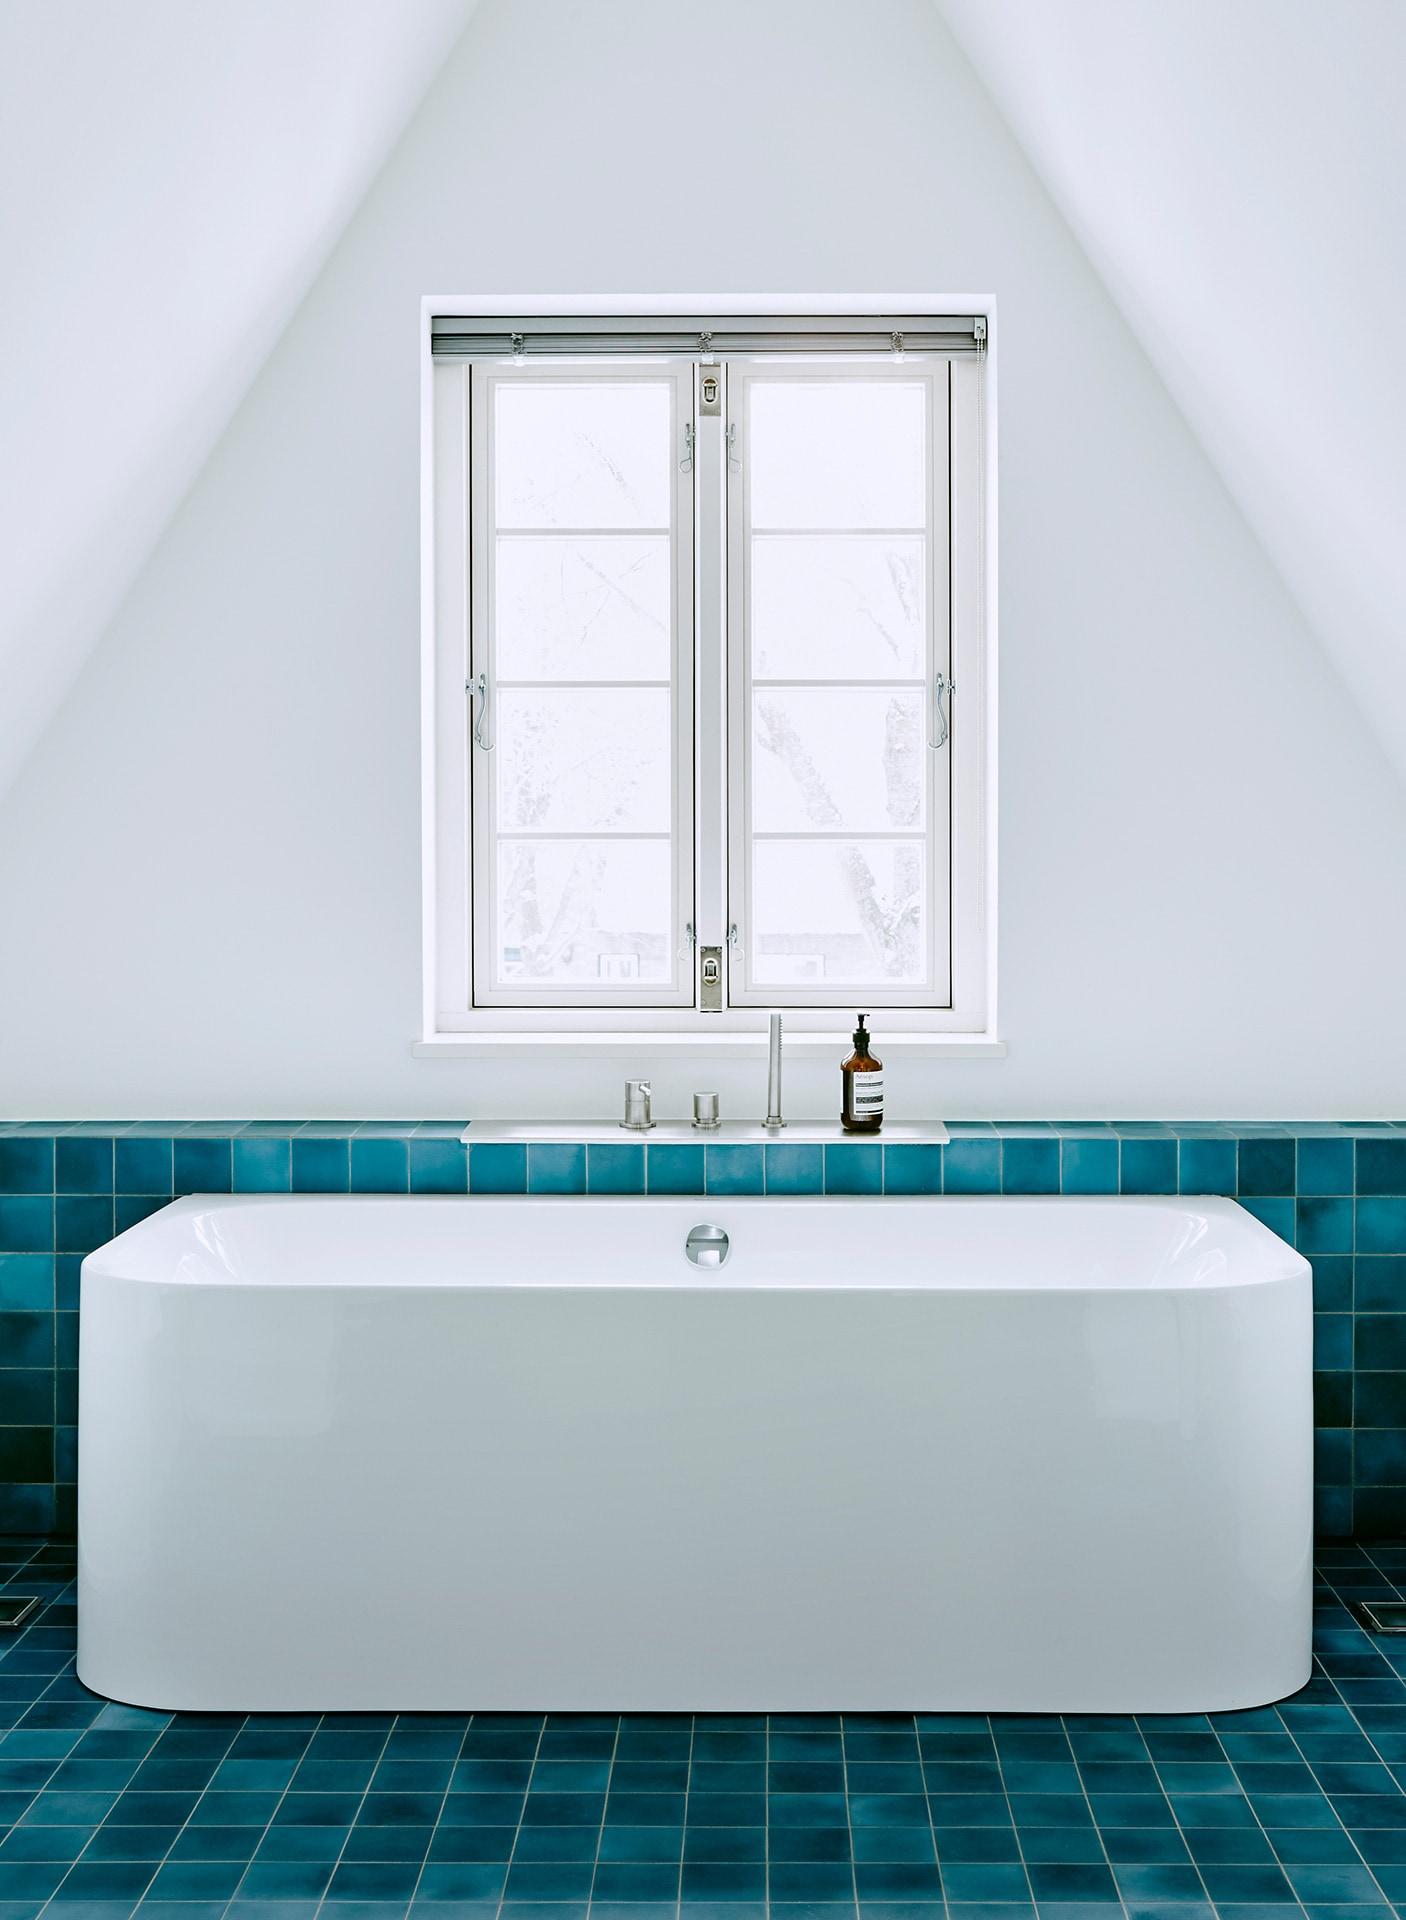 VIA Uniplatte N° 43 in dunkelblau im Bad mit Badewanne am Fenster